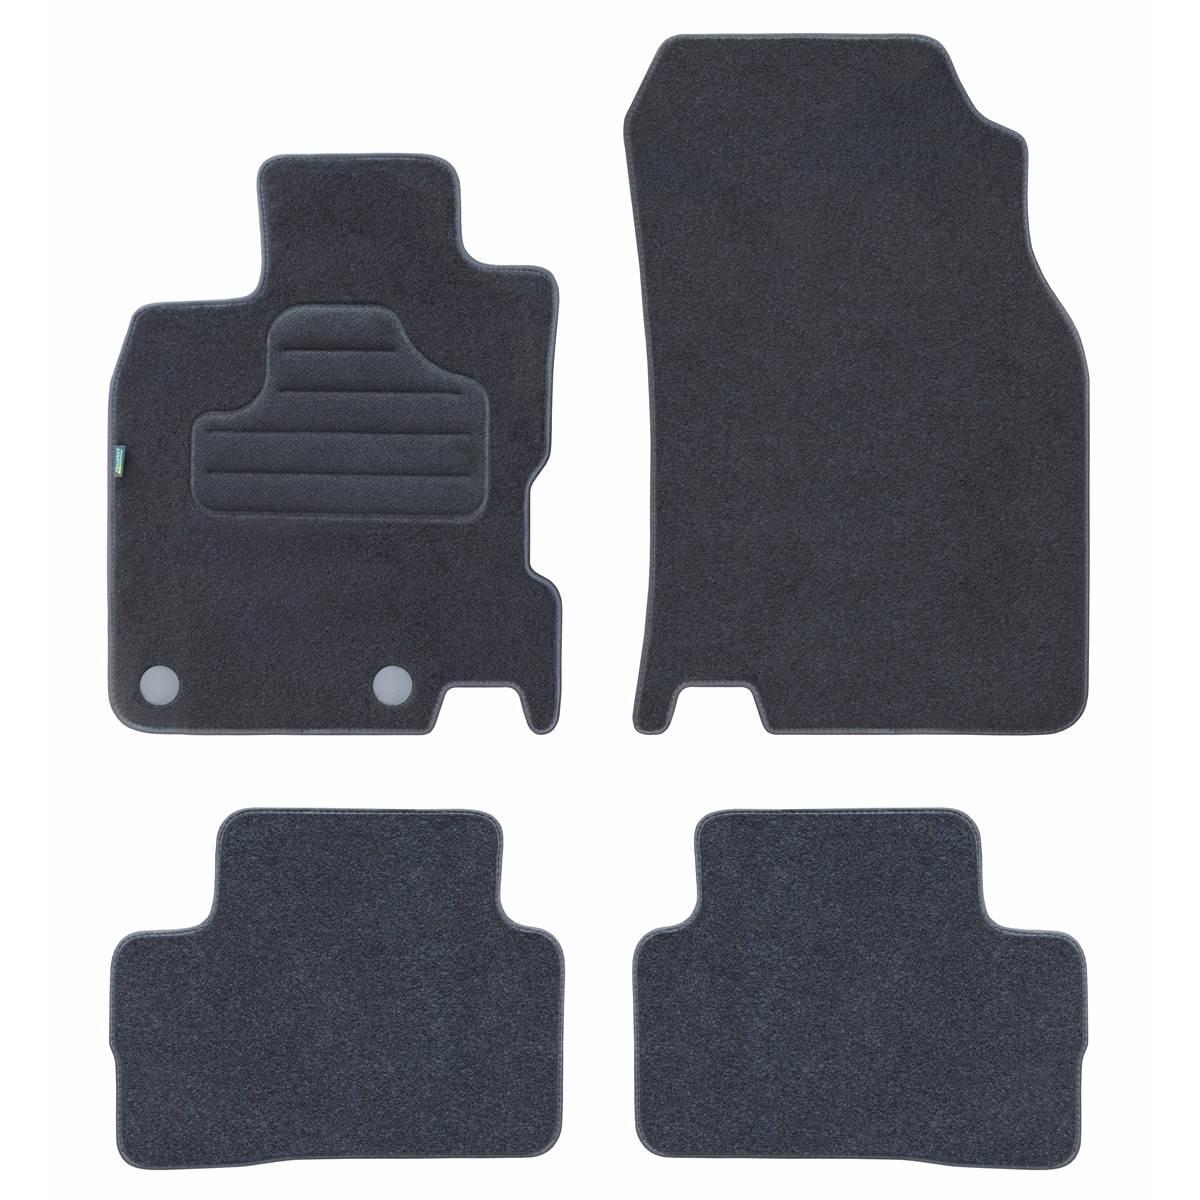 4 tapis de voiture moquette pour renault kadjar feu vert. Black Bedroom Furniture Sets. Home Design Ideas